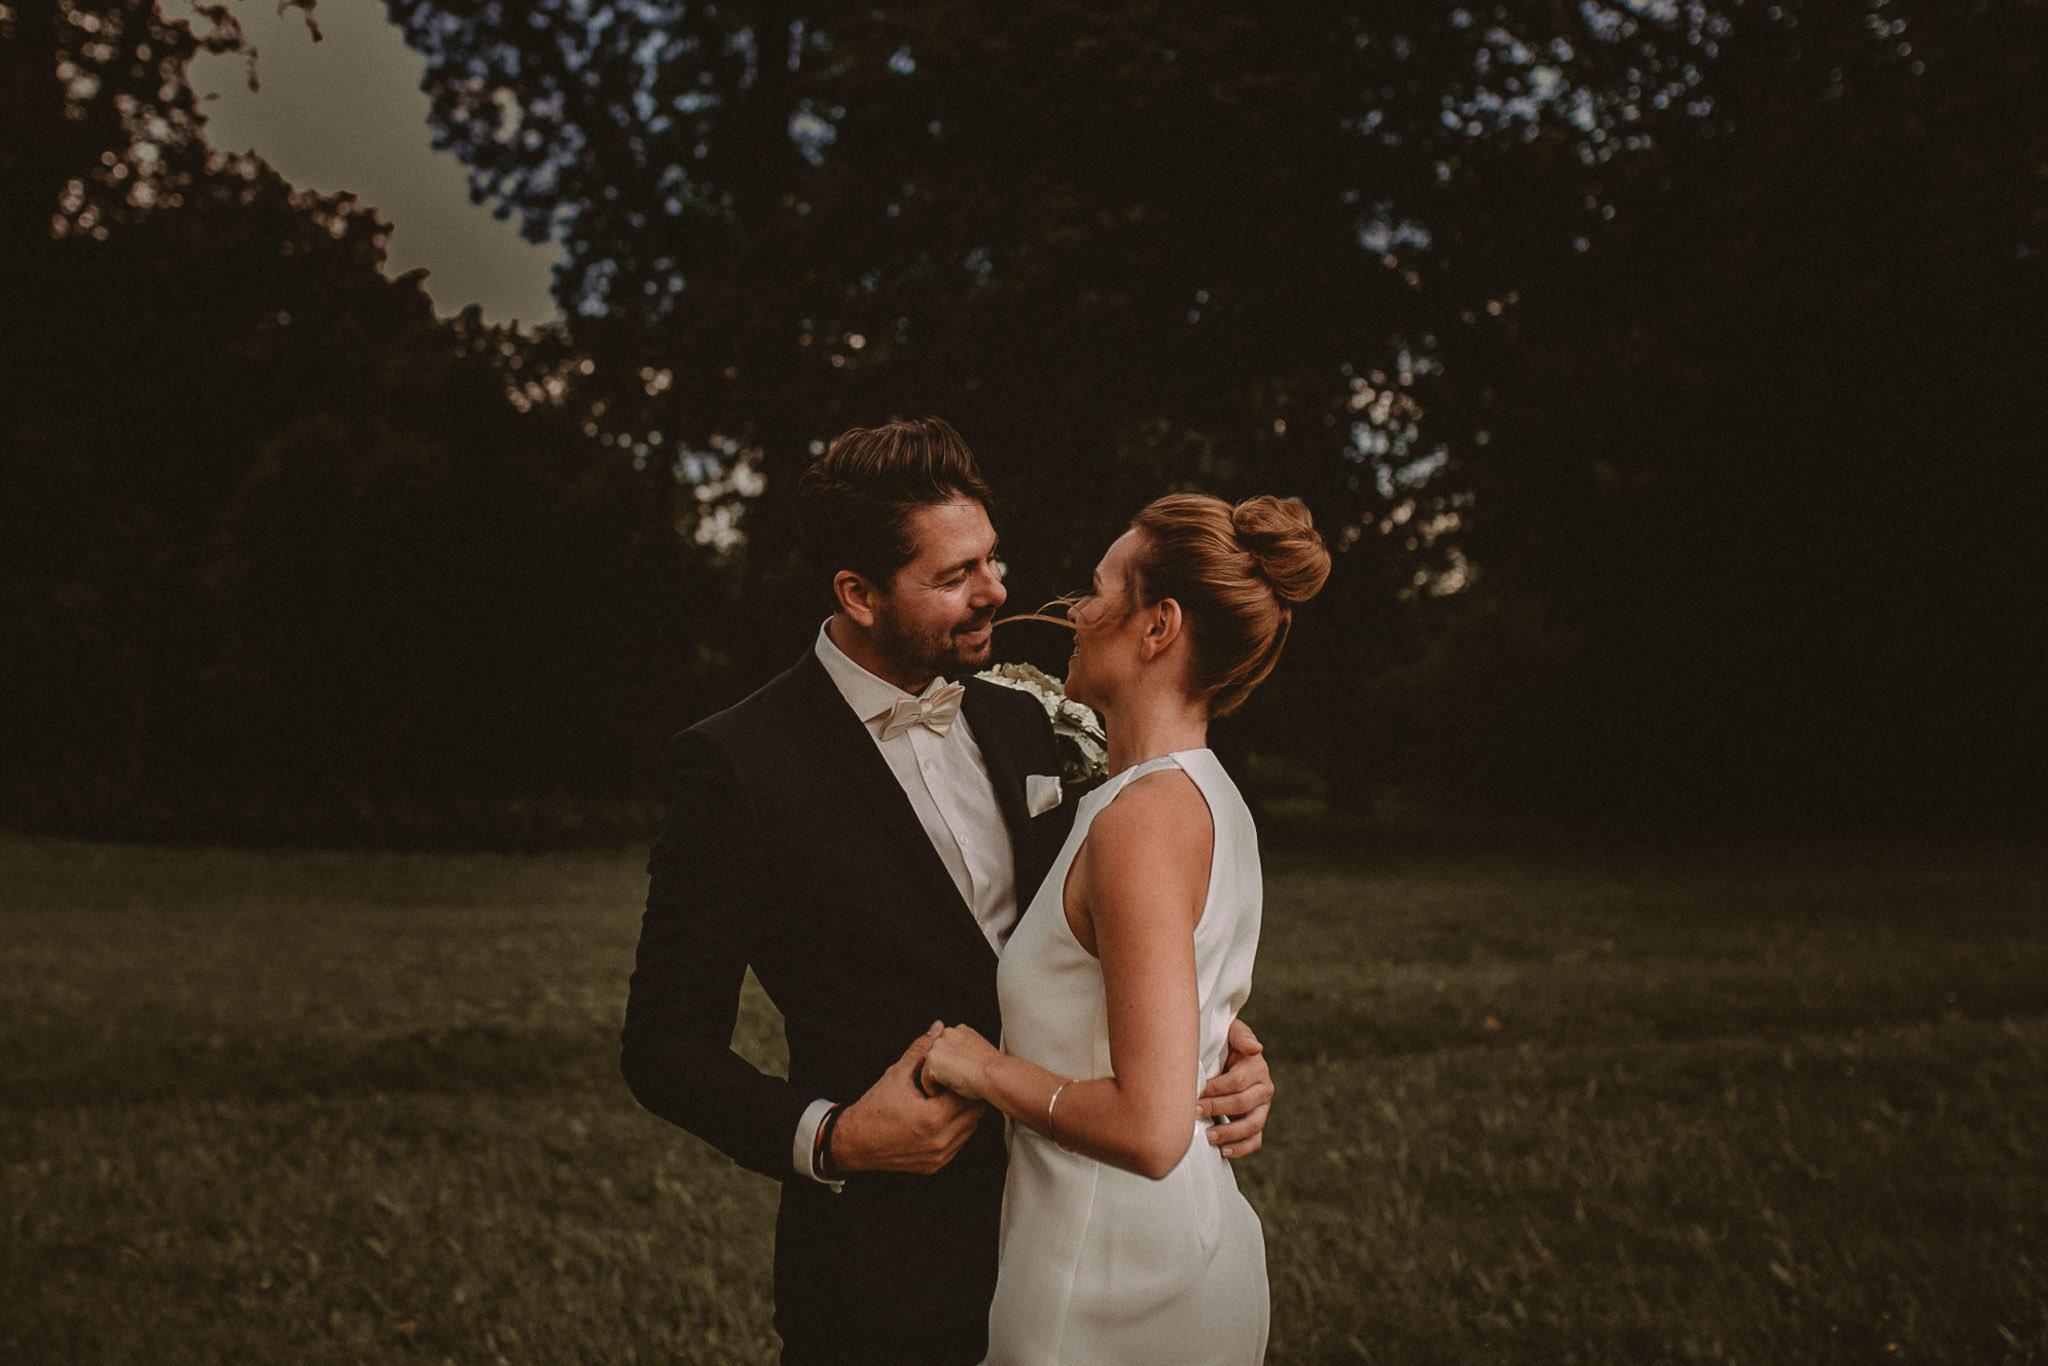 Best Wedding Photographer in Berlin, Brandenburg